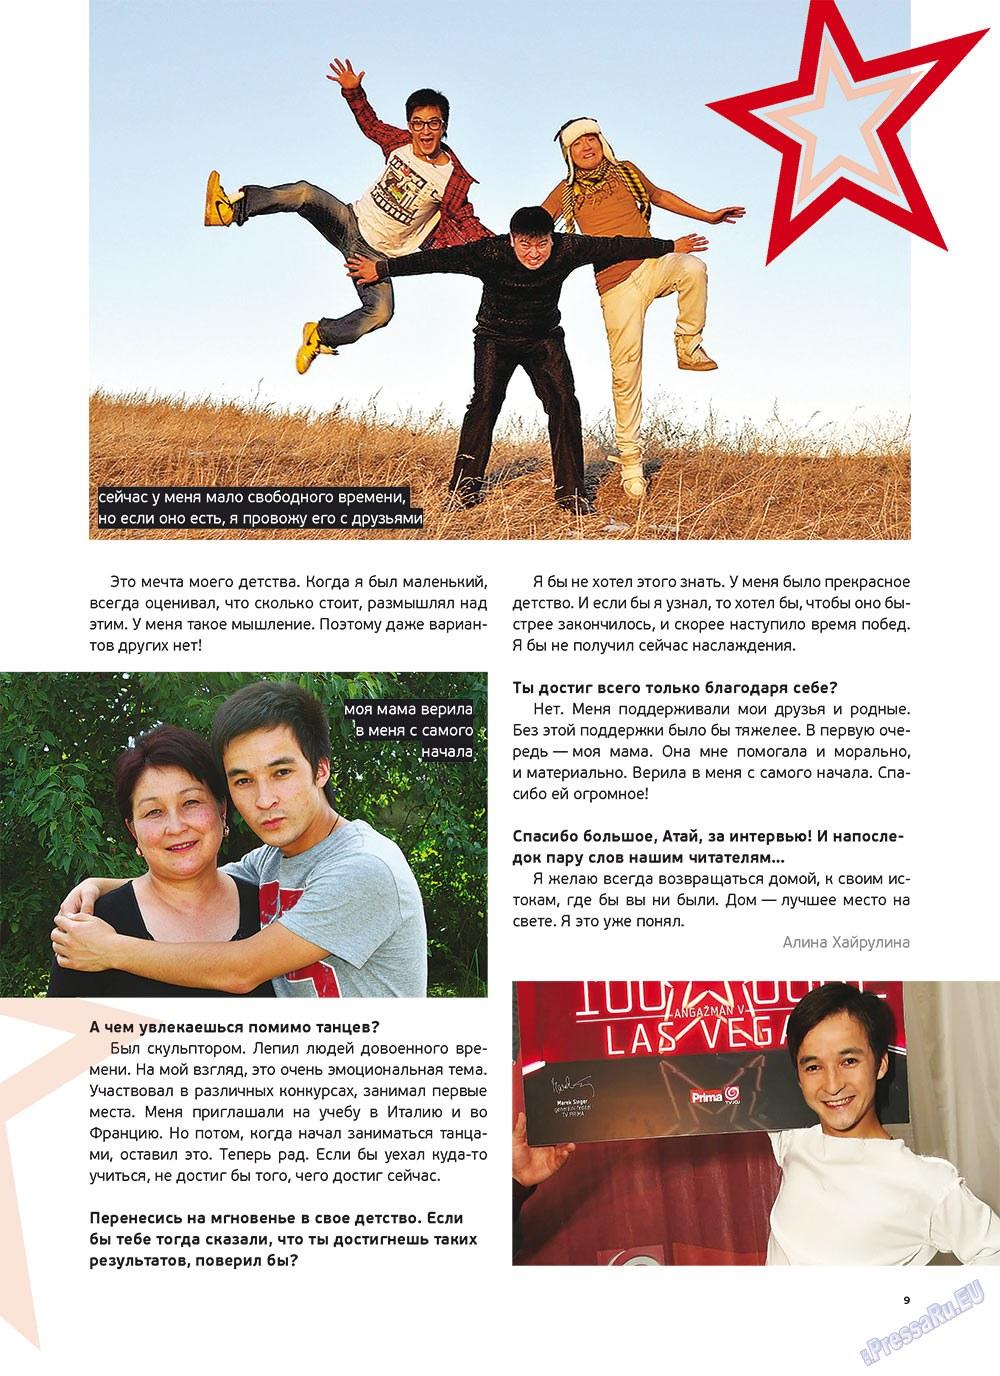 Артек (журнал). 2011 год, номер 5, стр. 11